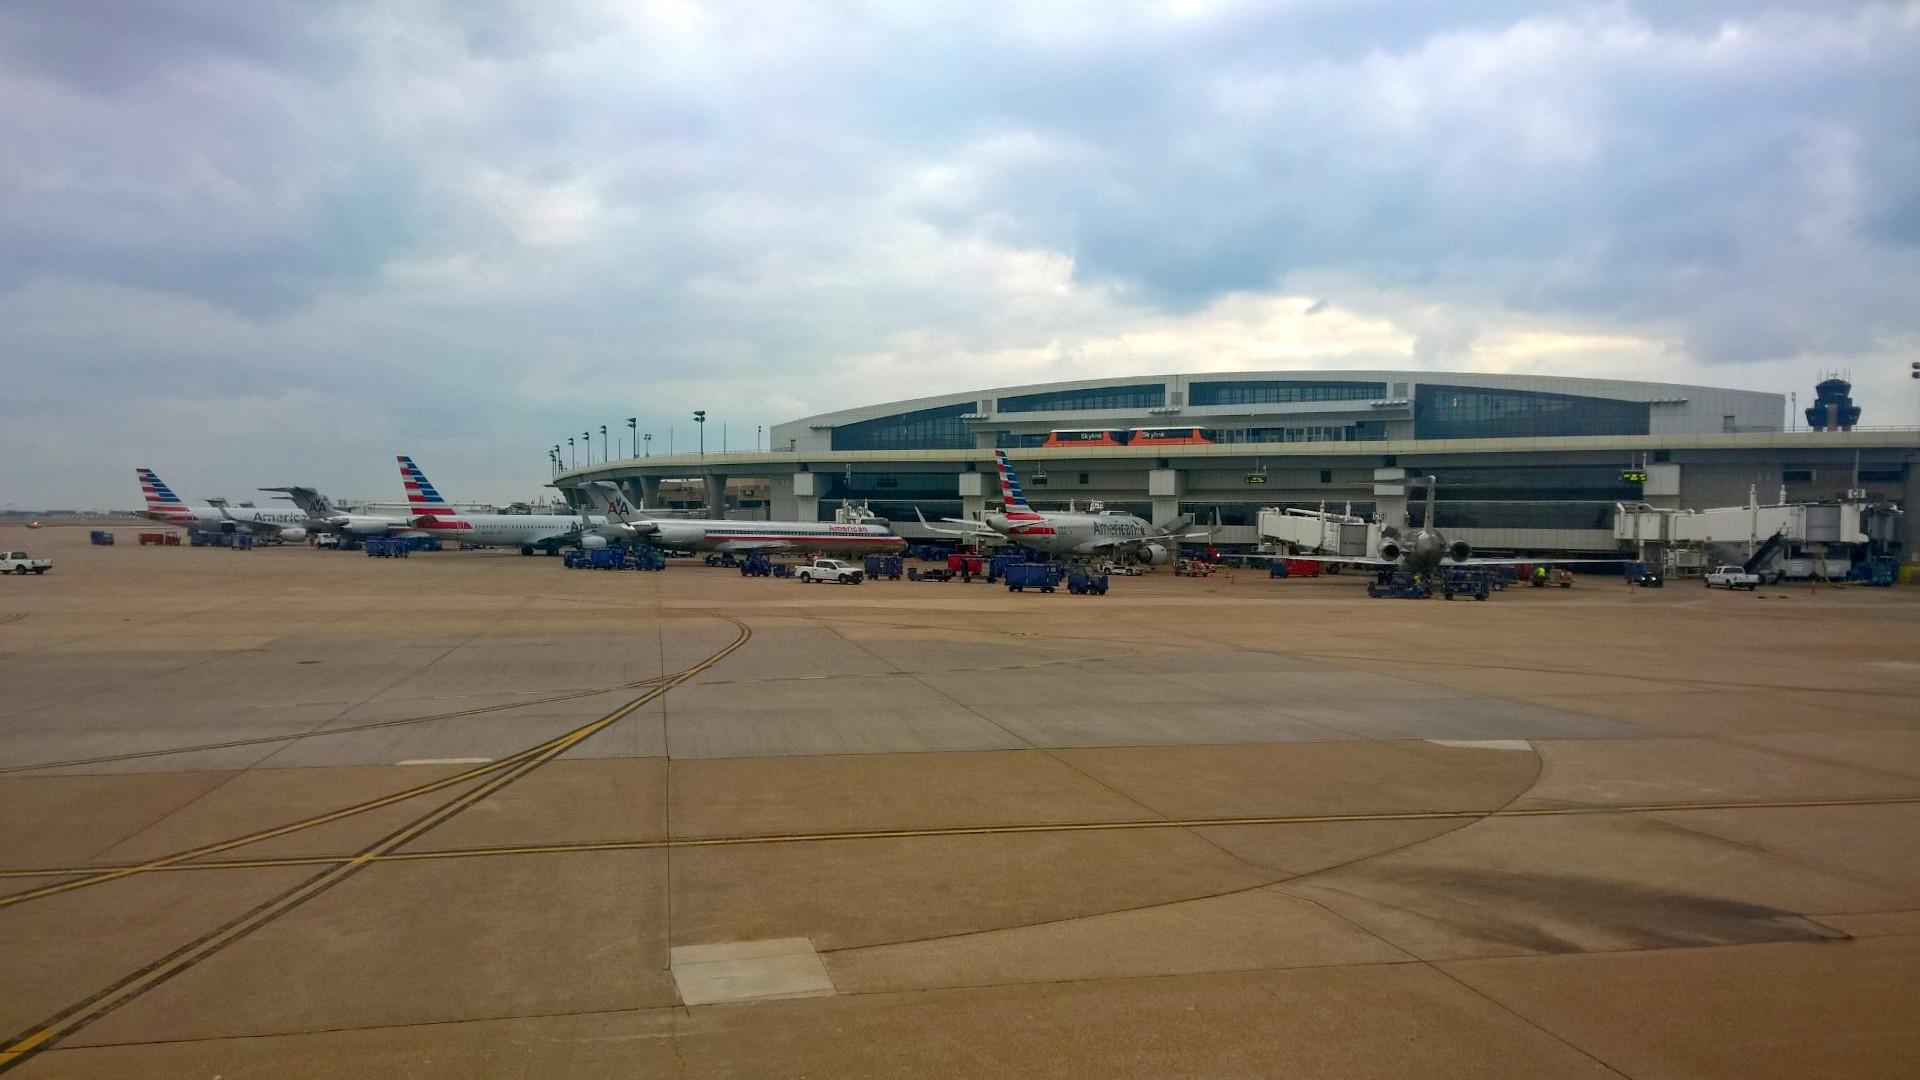 Terminal Dallas (DFW) Airport